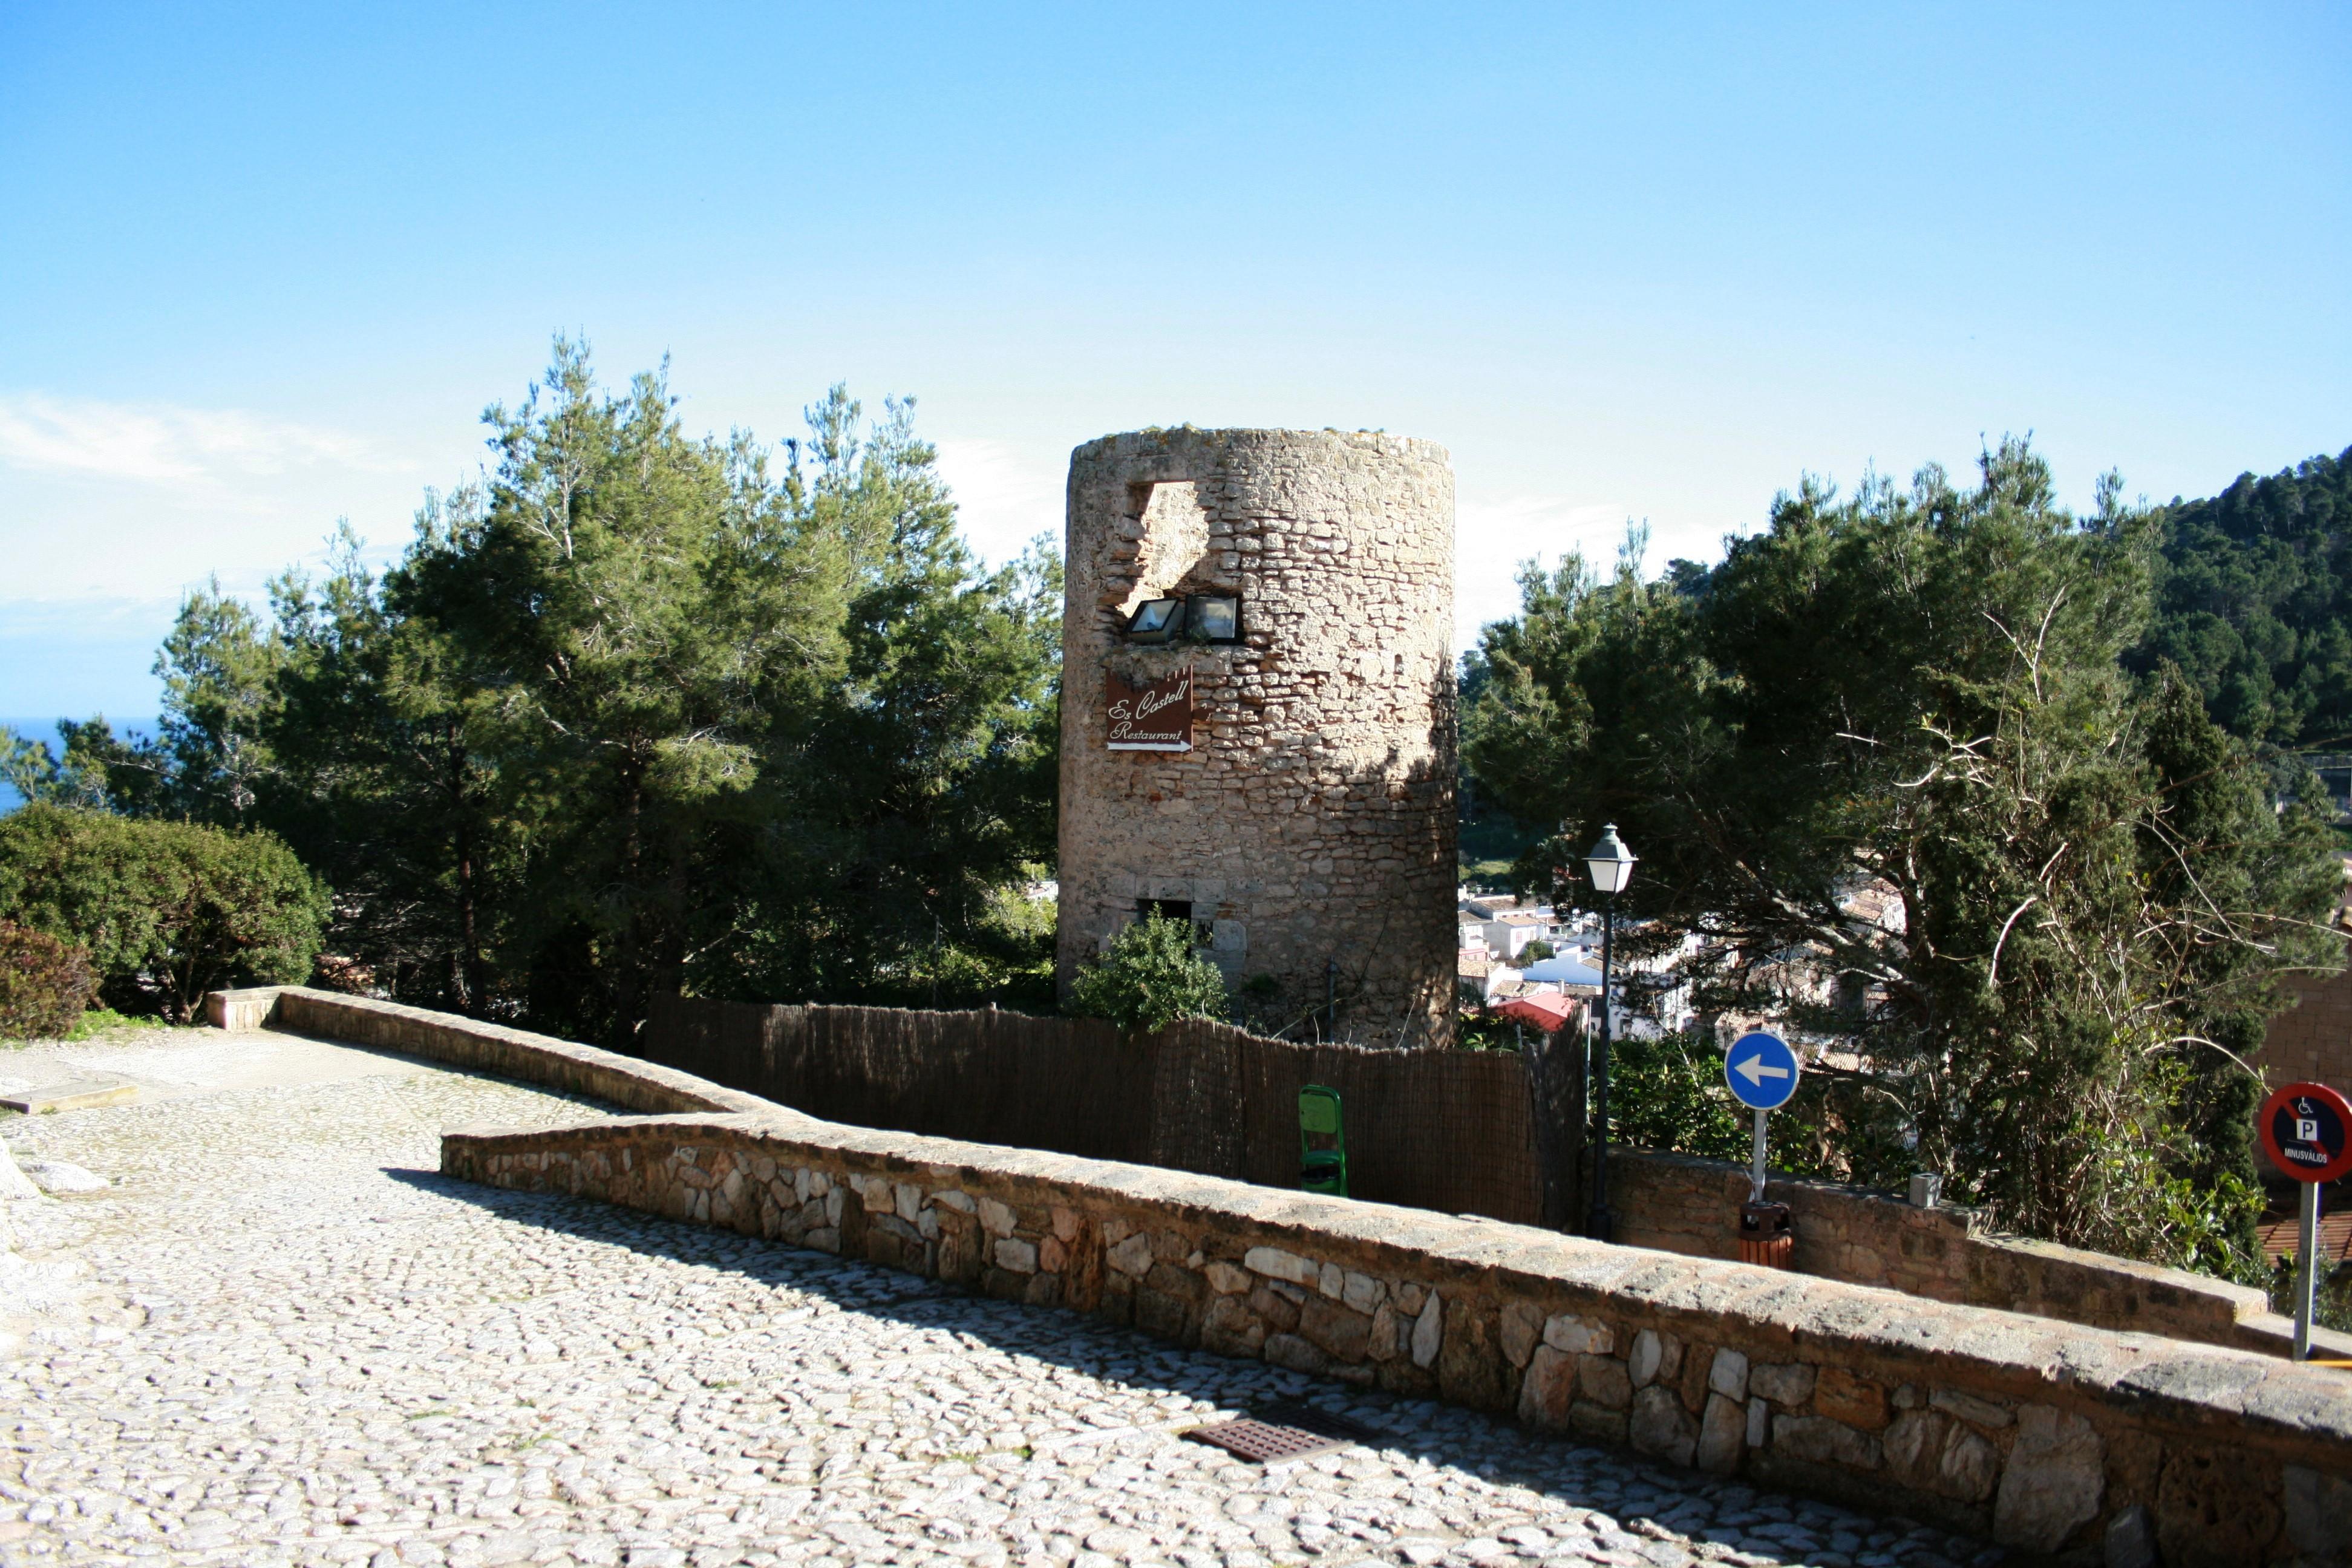 File:Capdepera - Castell de Capdepera 03 ies.jpg - Wikimedia Commons